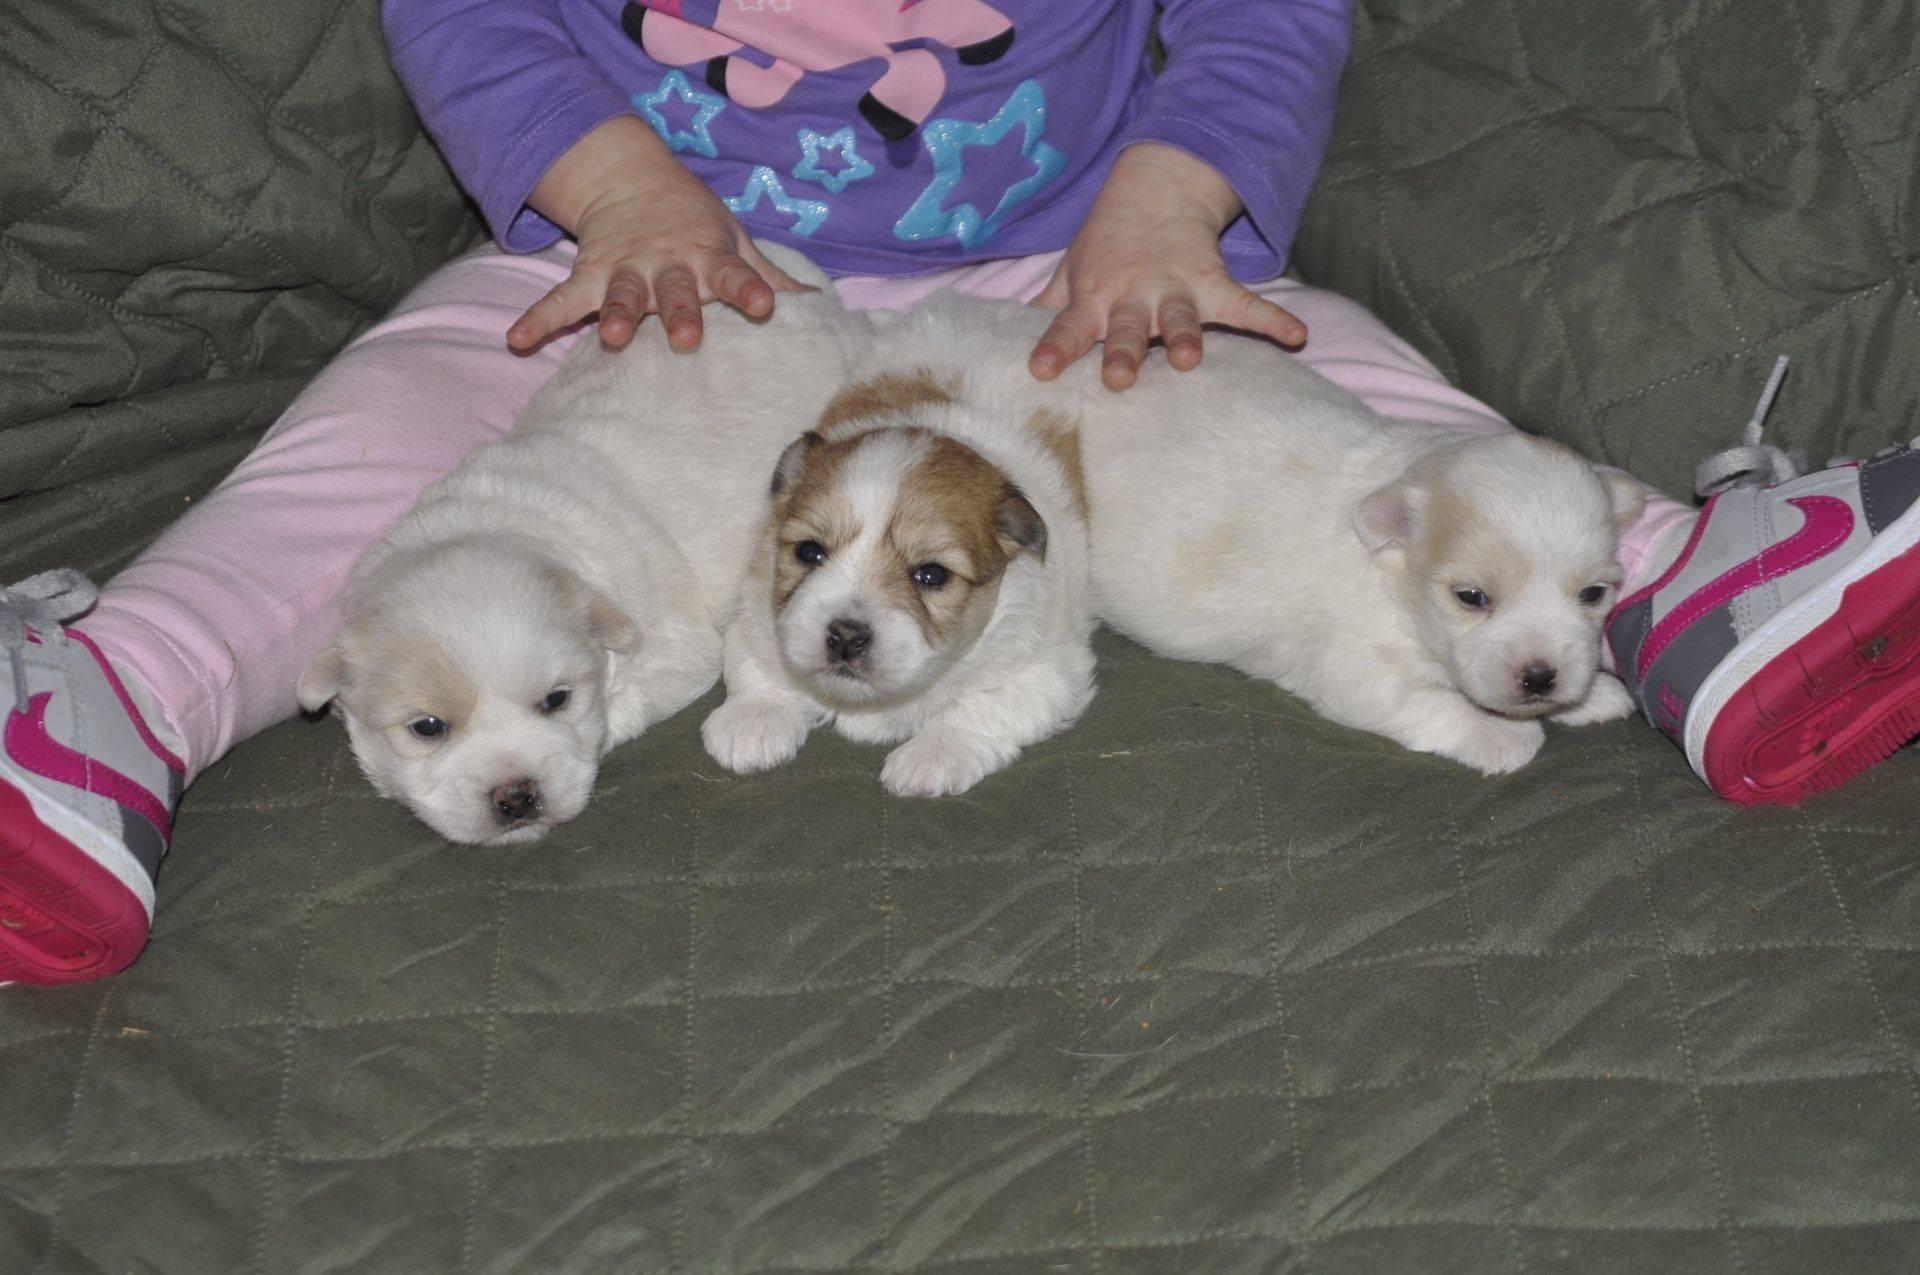 Trained Coton de tulear puppies